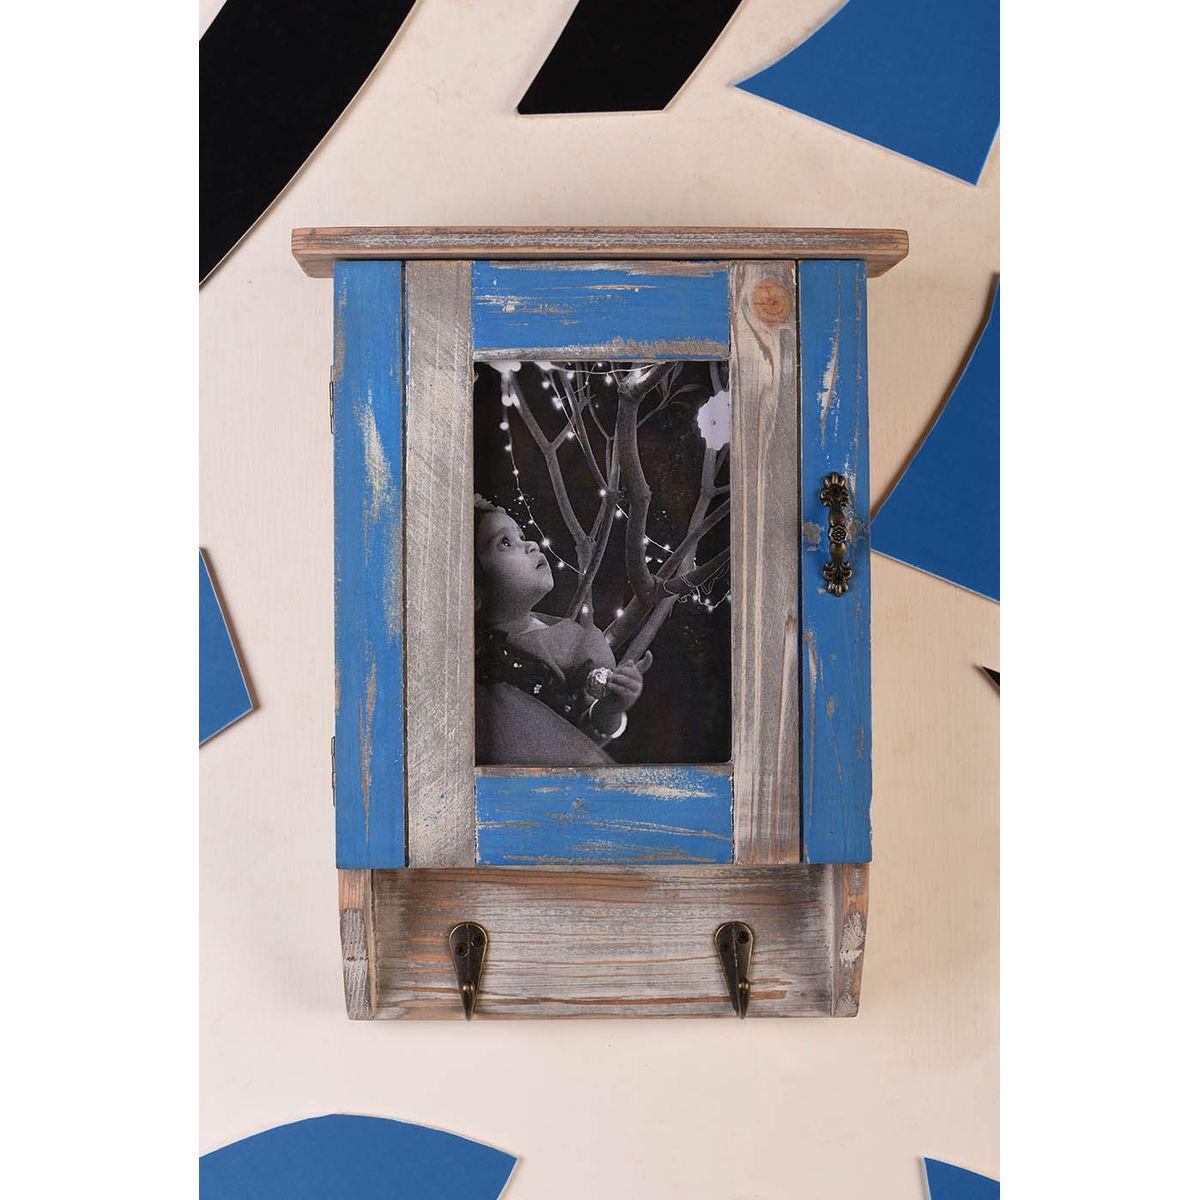 OddCroft Gatekeeper Mounted Keyholder Box with Photo Frame - Lagoon Blue